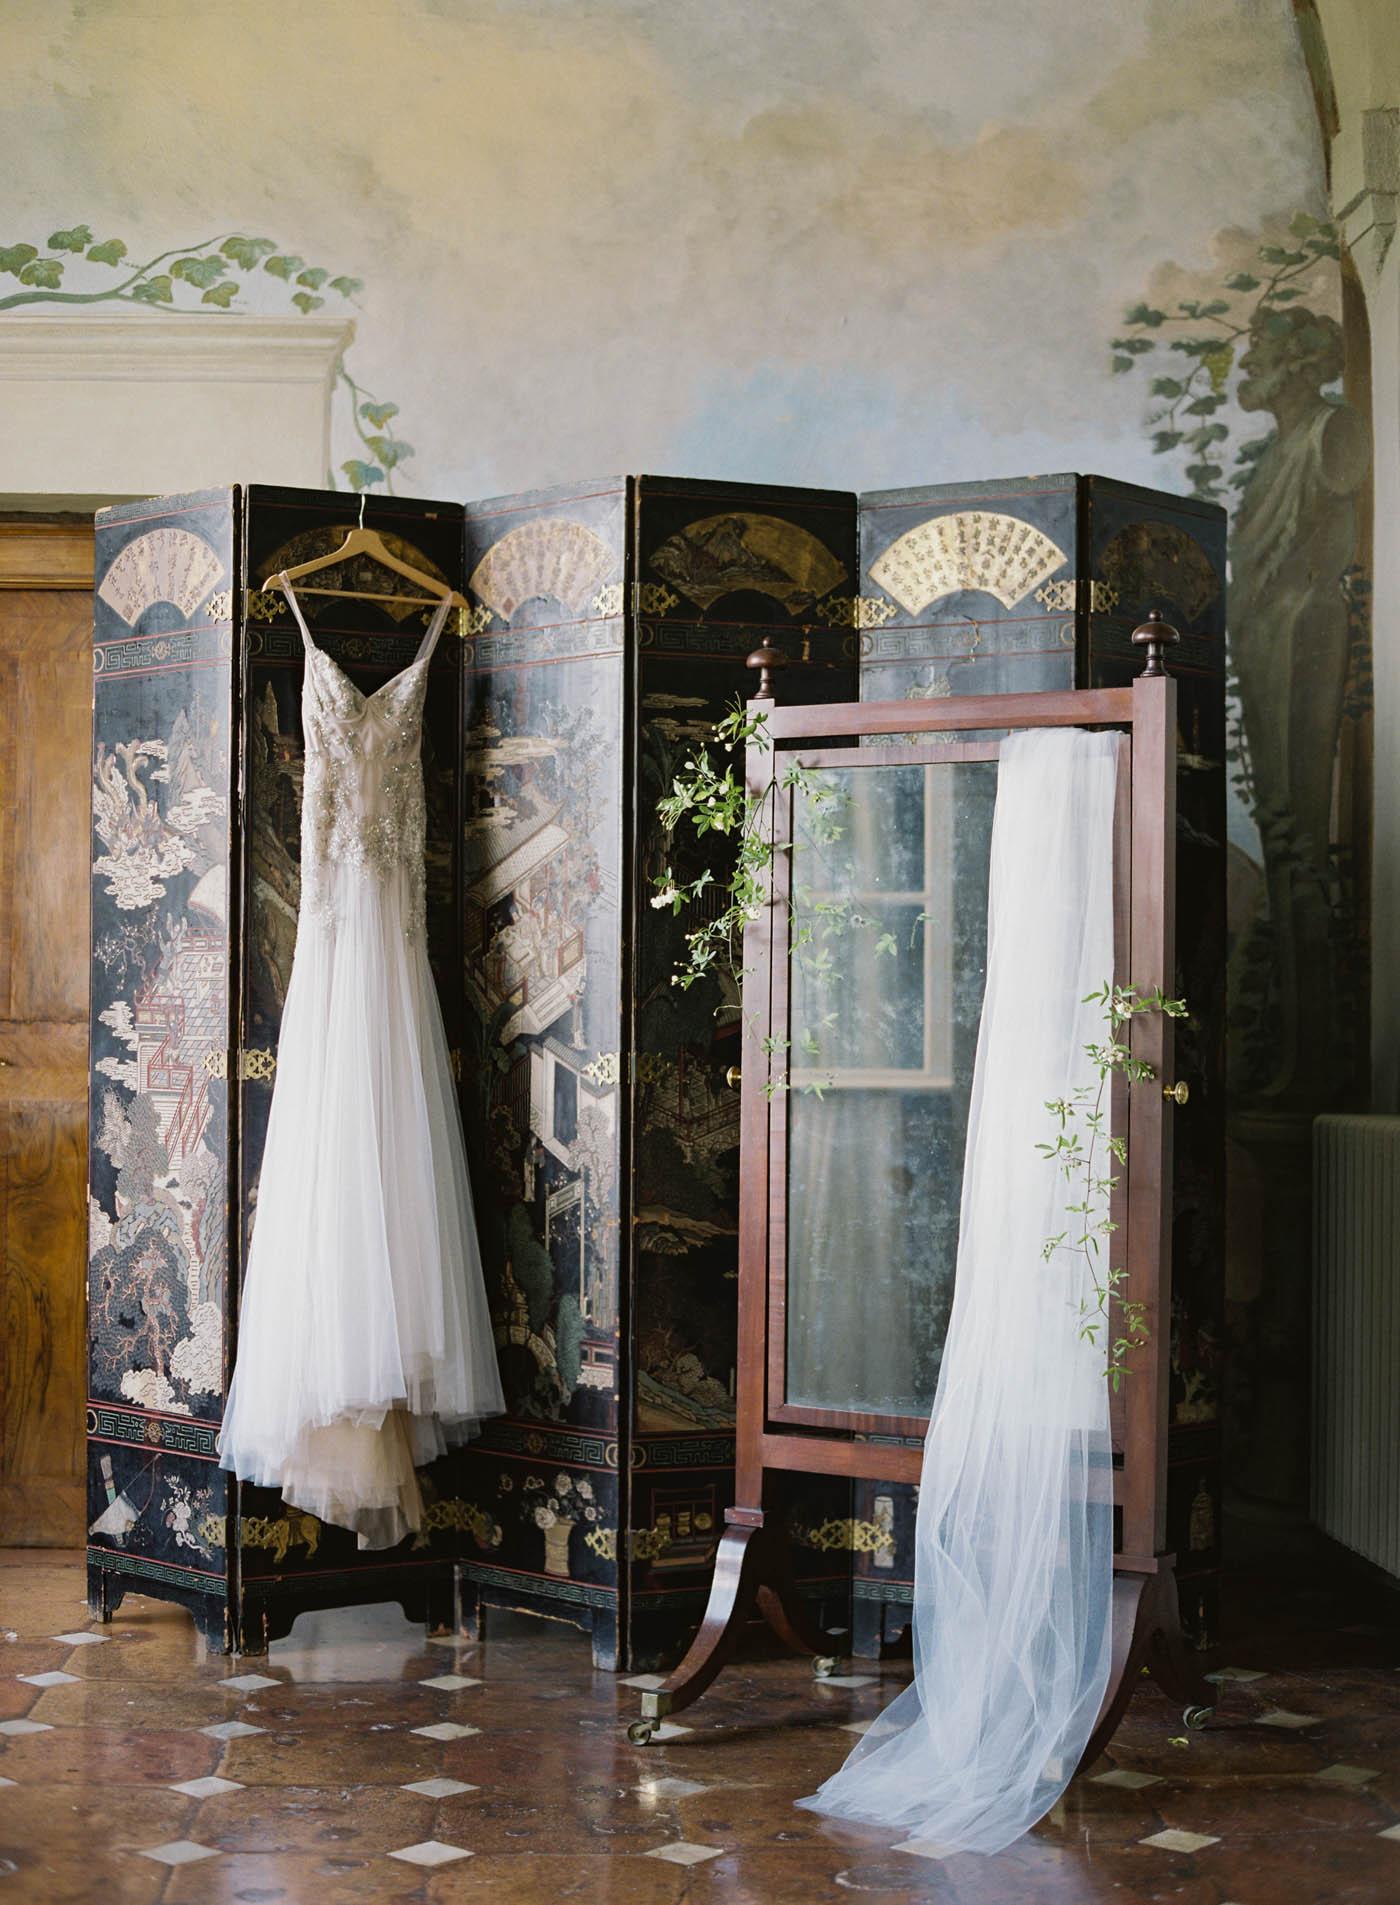 Villa_Cetinale_Wedding-10-Jen_Huang-ElanJacob-125-Jen_Huang-007320-R1-007.jpg